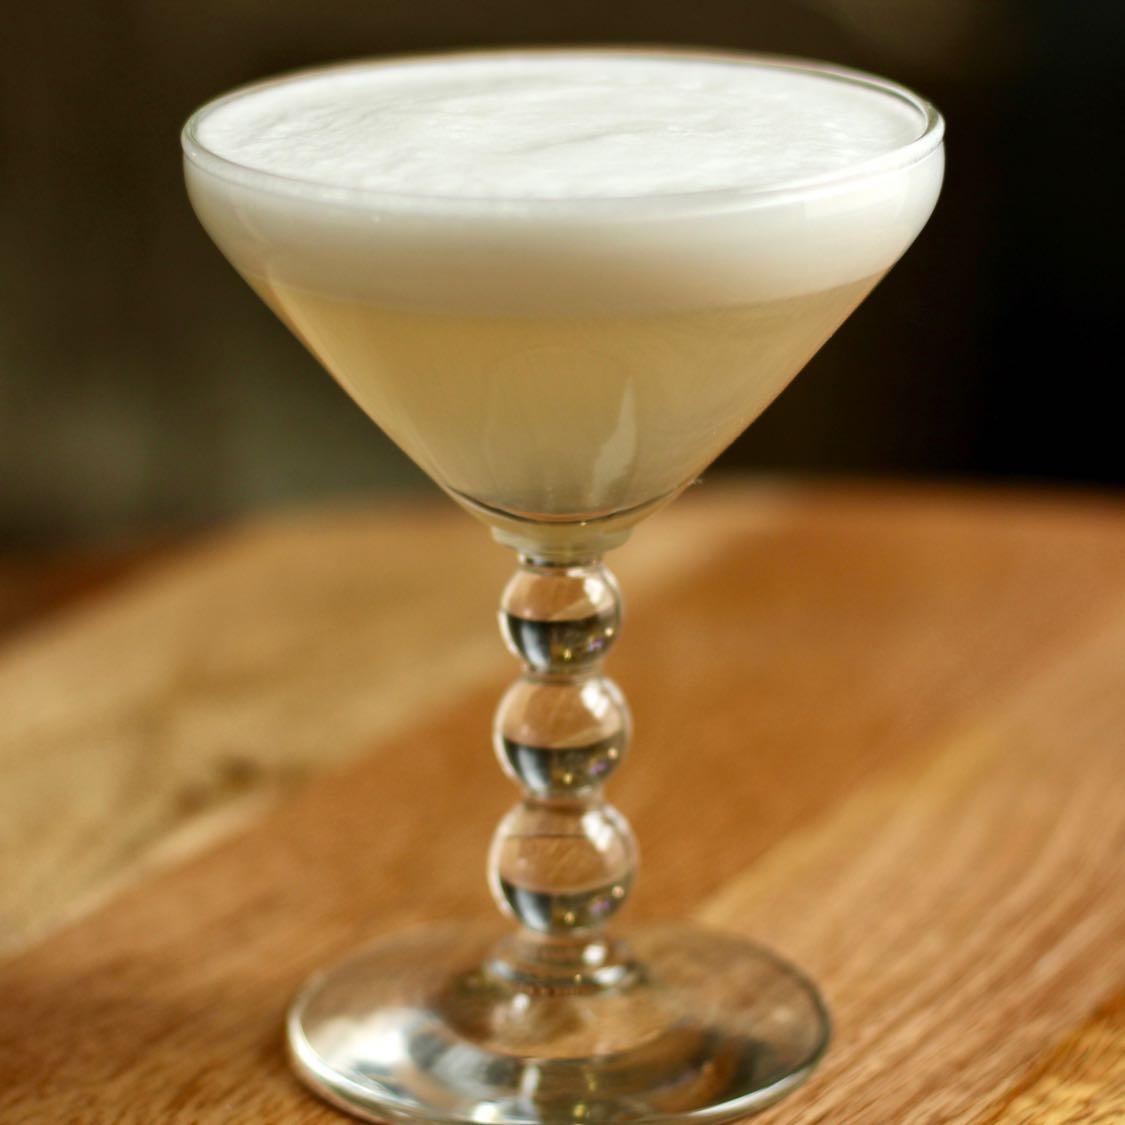 White Lady Cocktail - Original 1934 Savoy Cocktail Guide Recipe